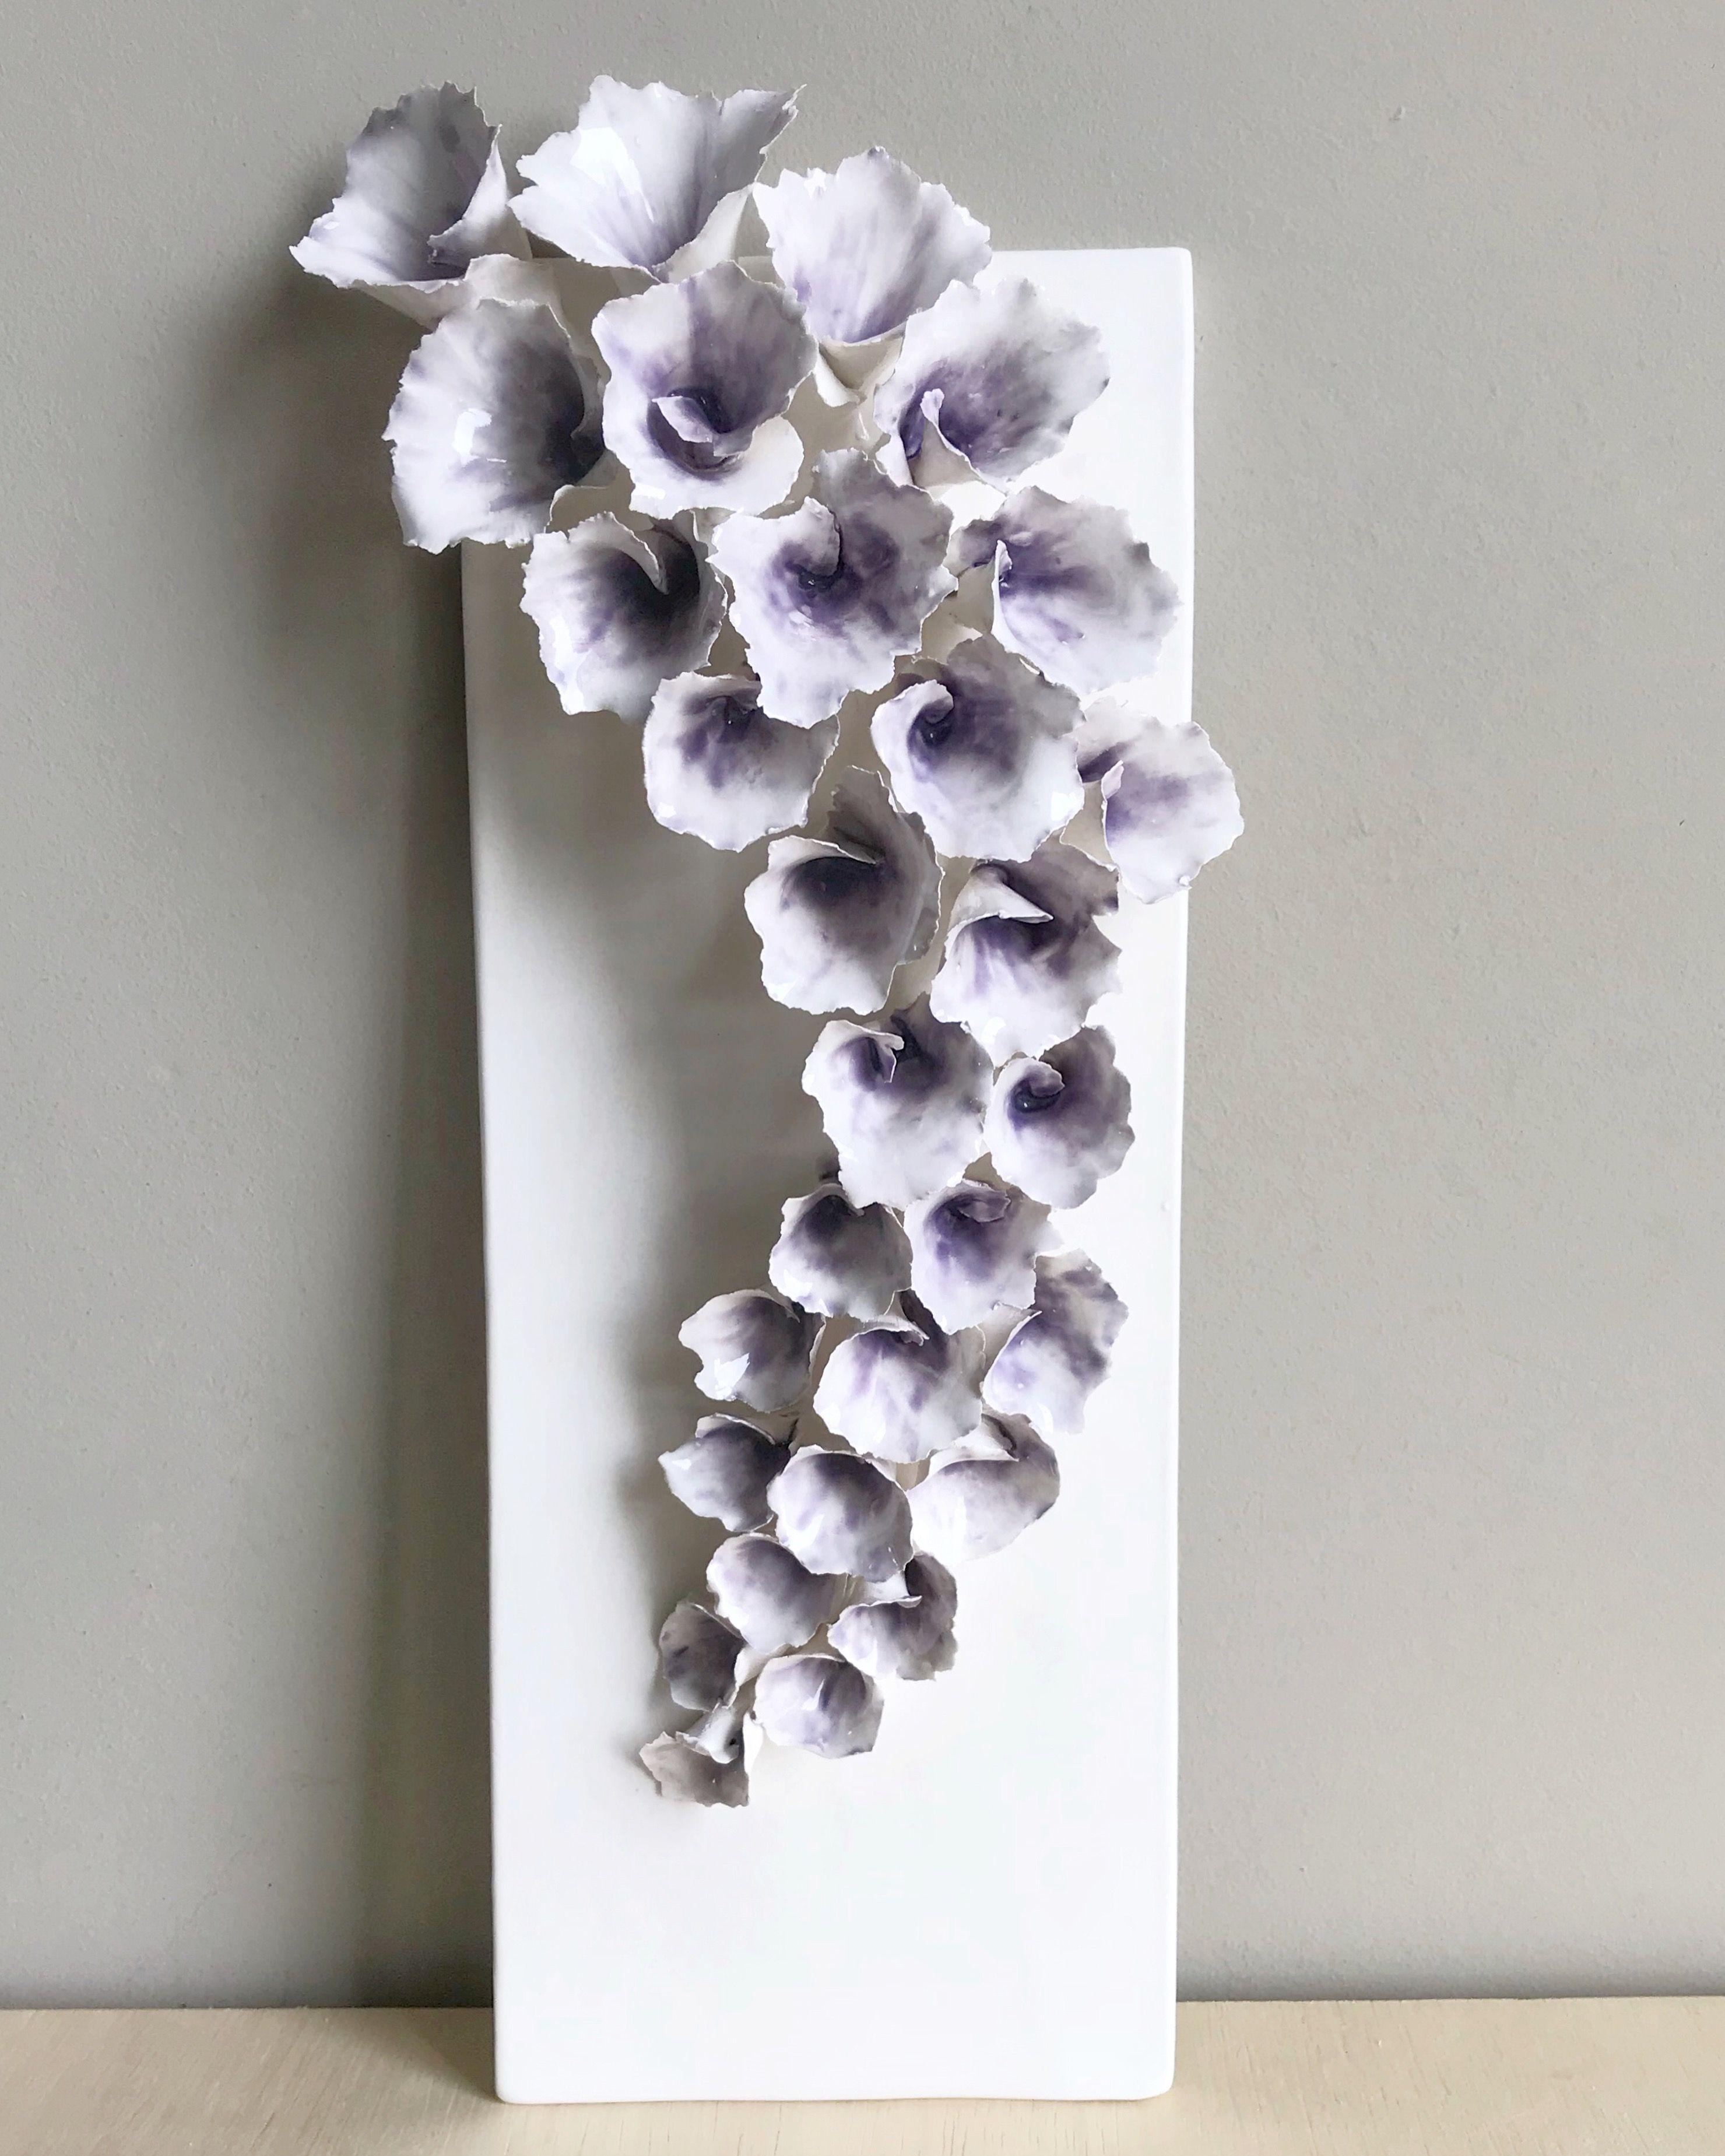 Ceramic Wall Flower Decor: ArtByJenF, Ceramic Plaque, Flower Art, Wall Art, Home